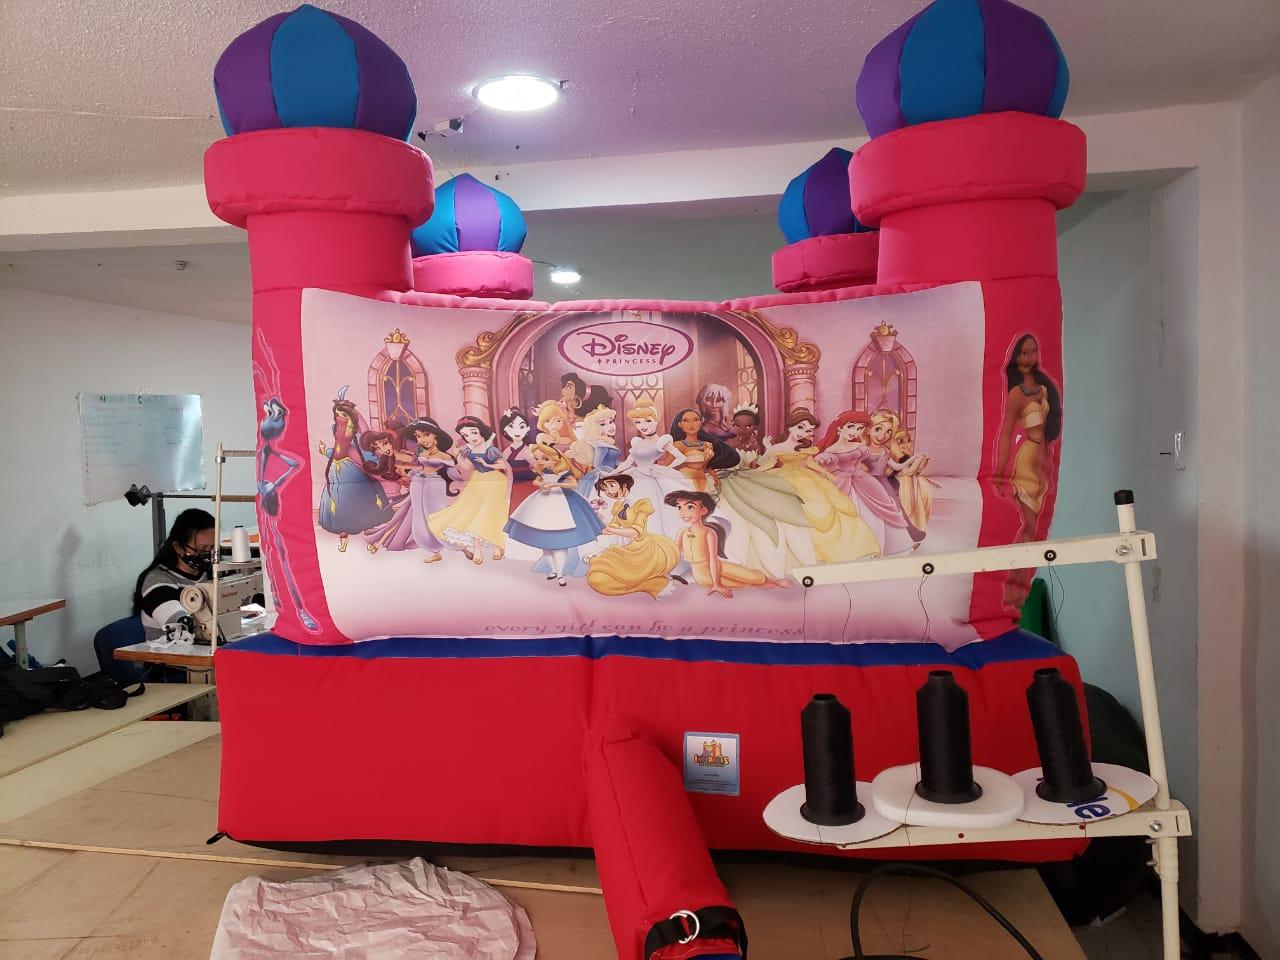 Castillo Inflable para niños 1.5mt x 1.5mt 5